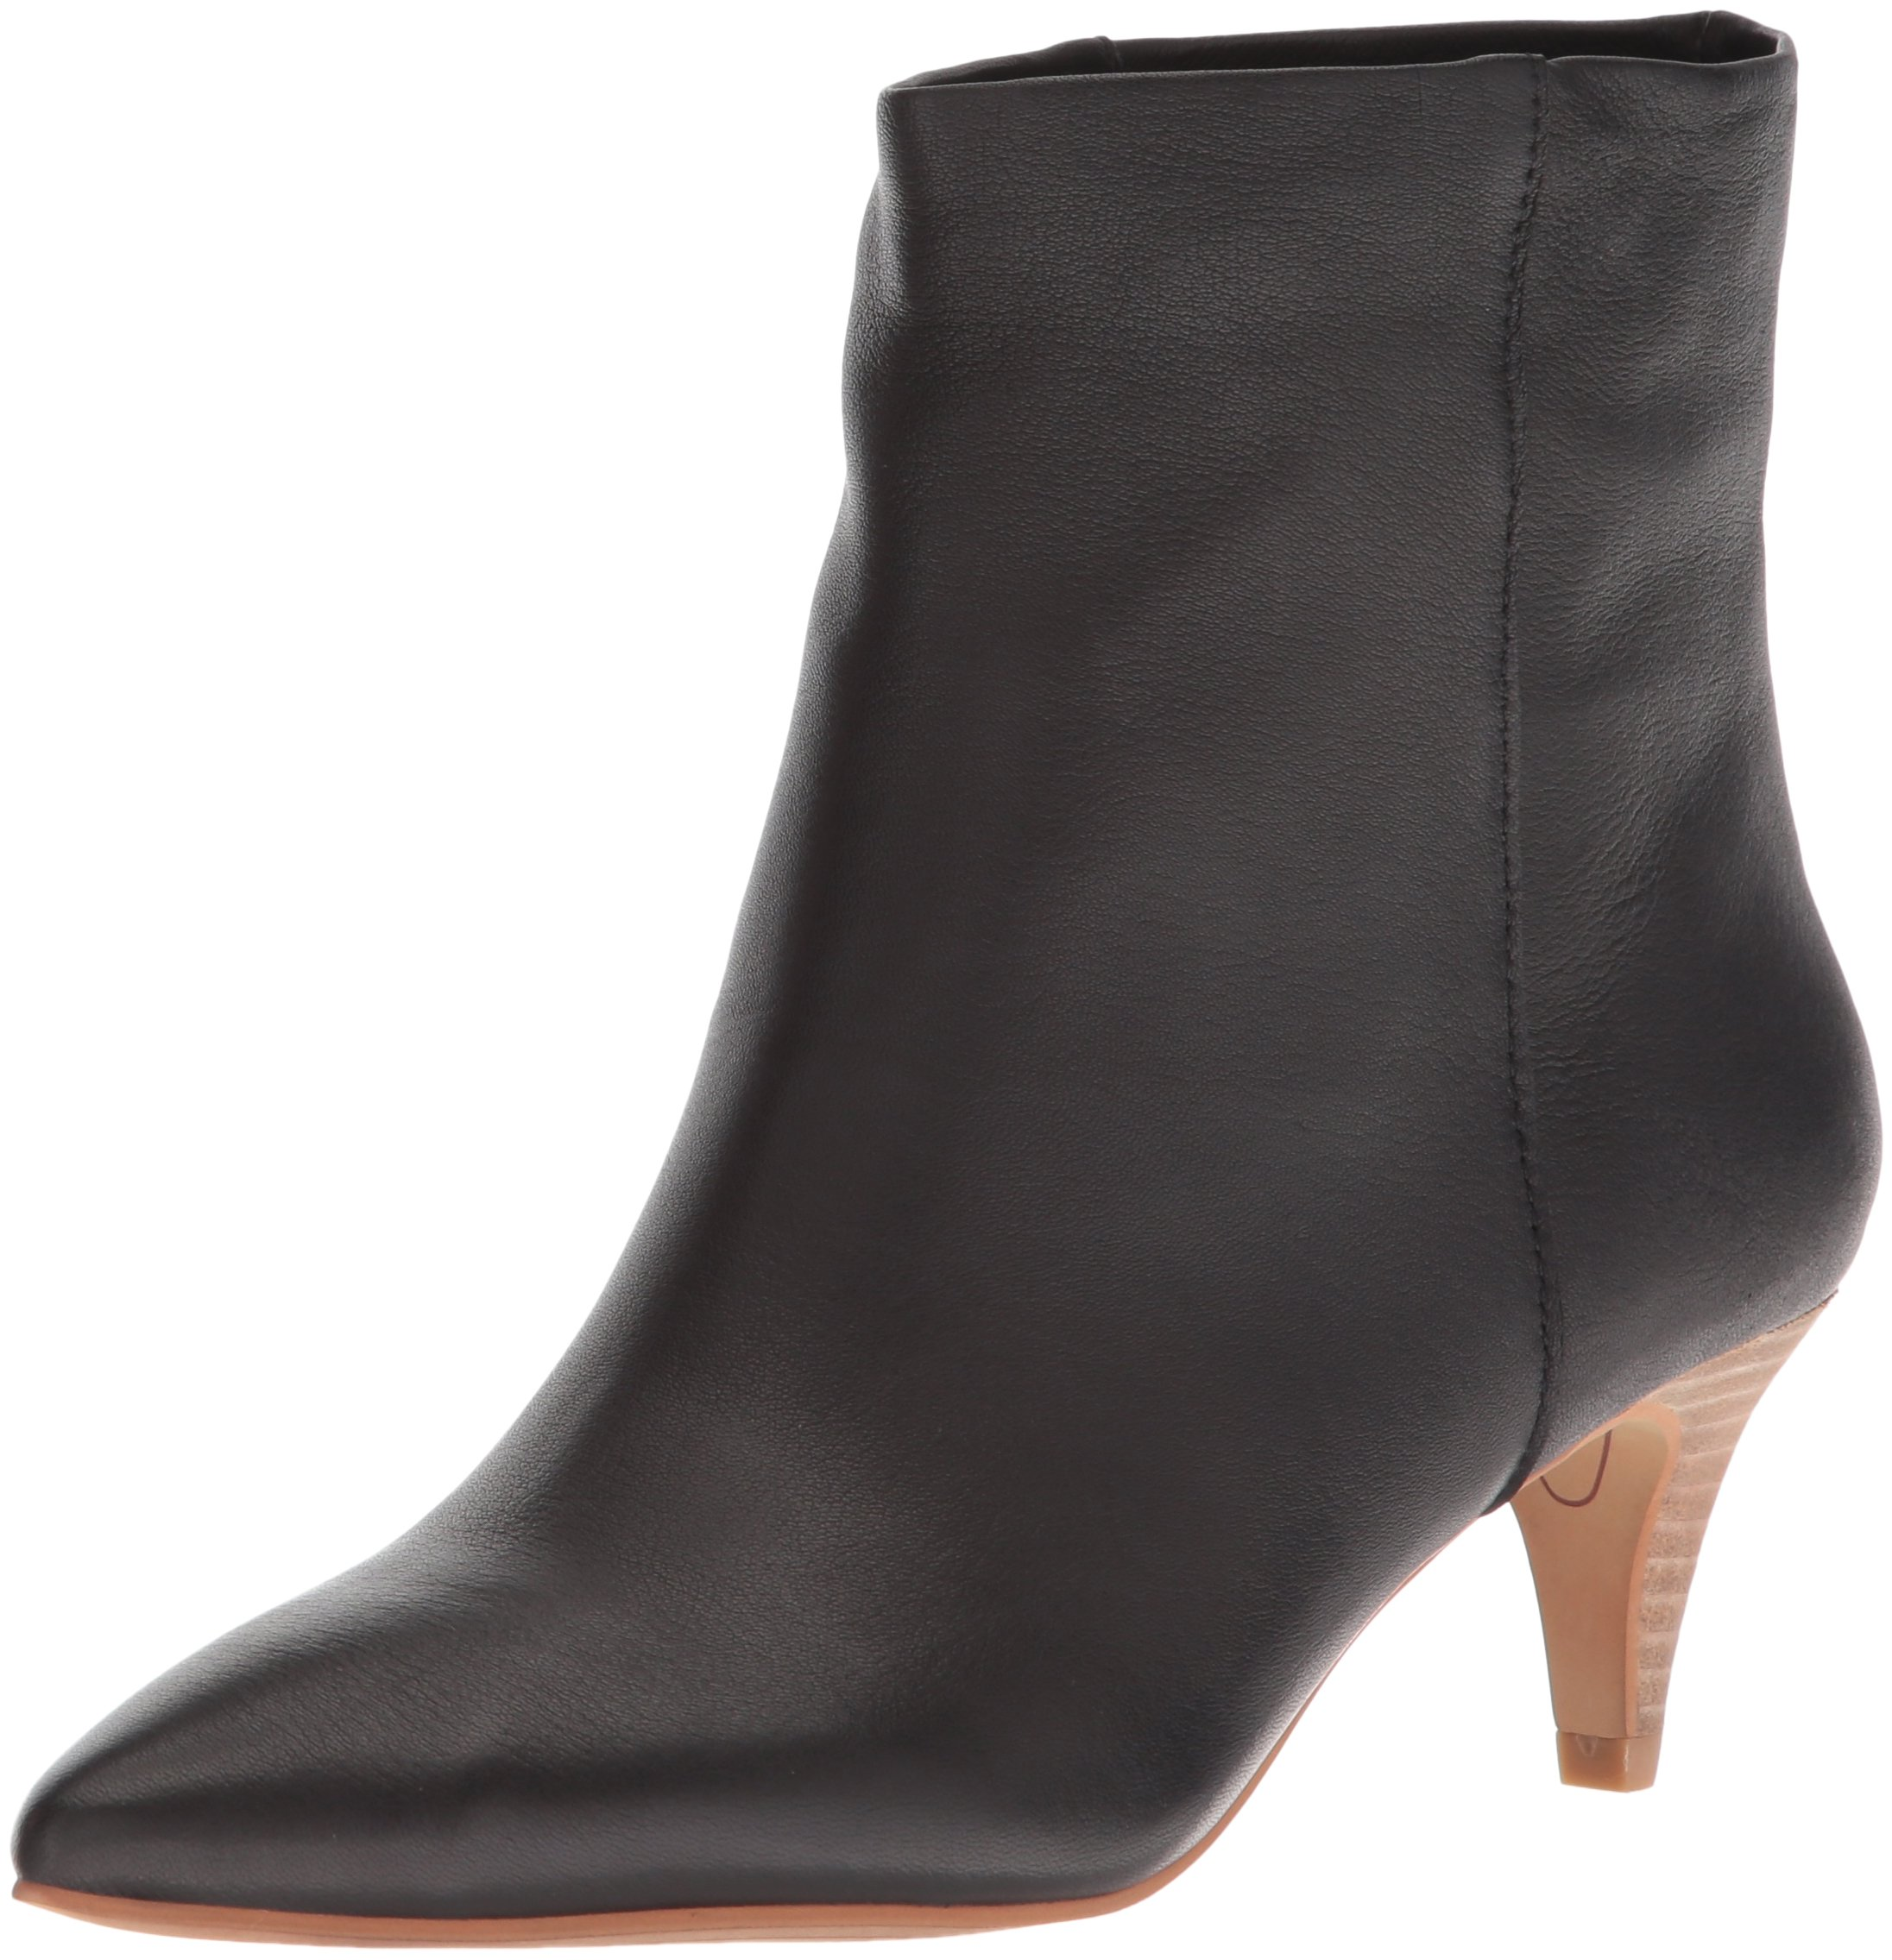 Dolce Vita Women's Deedee Ankle Boot, Black Leather, 9 M US